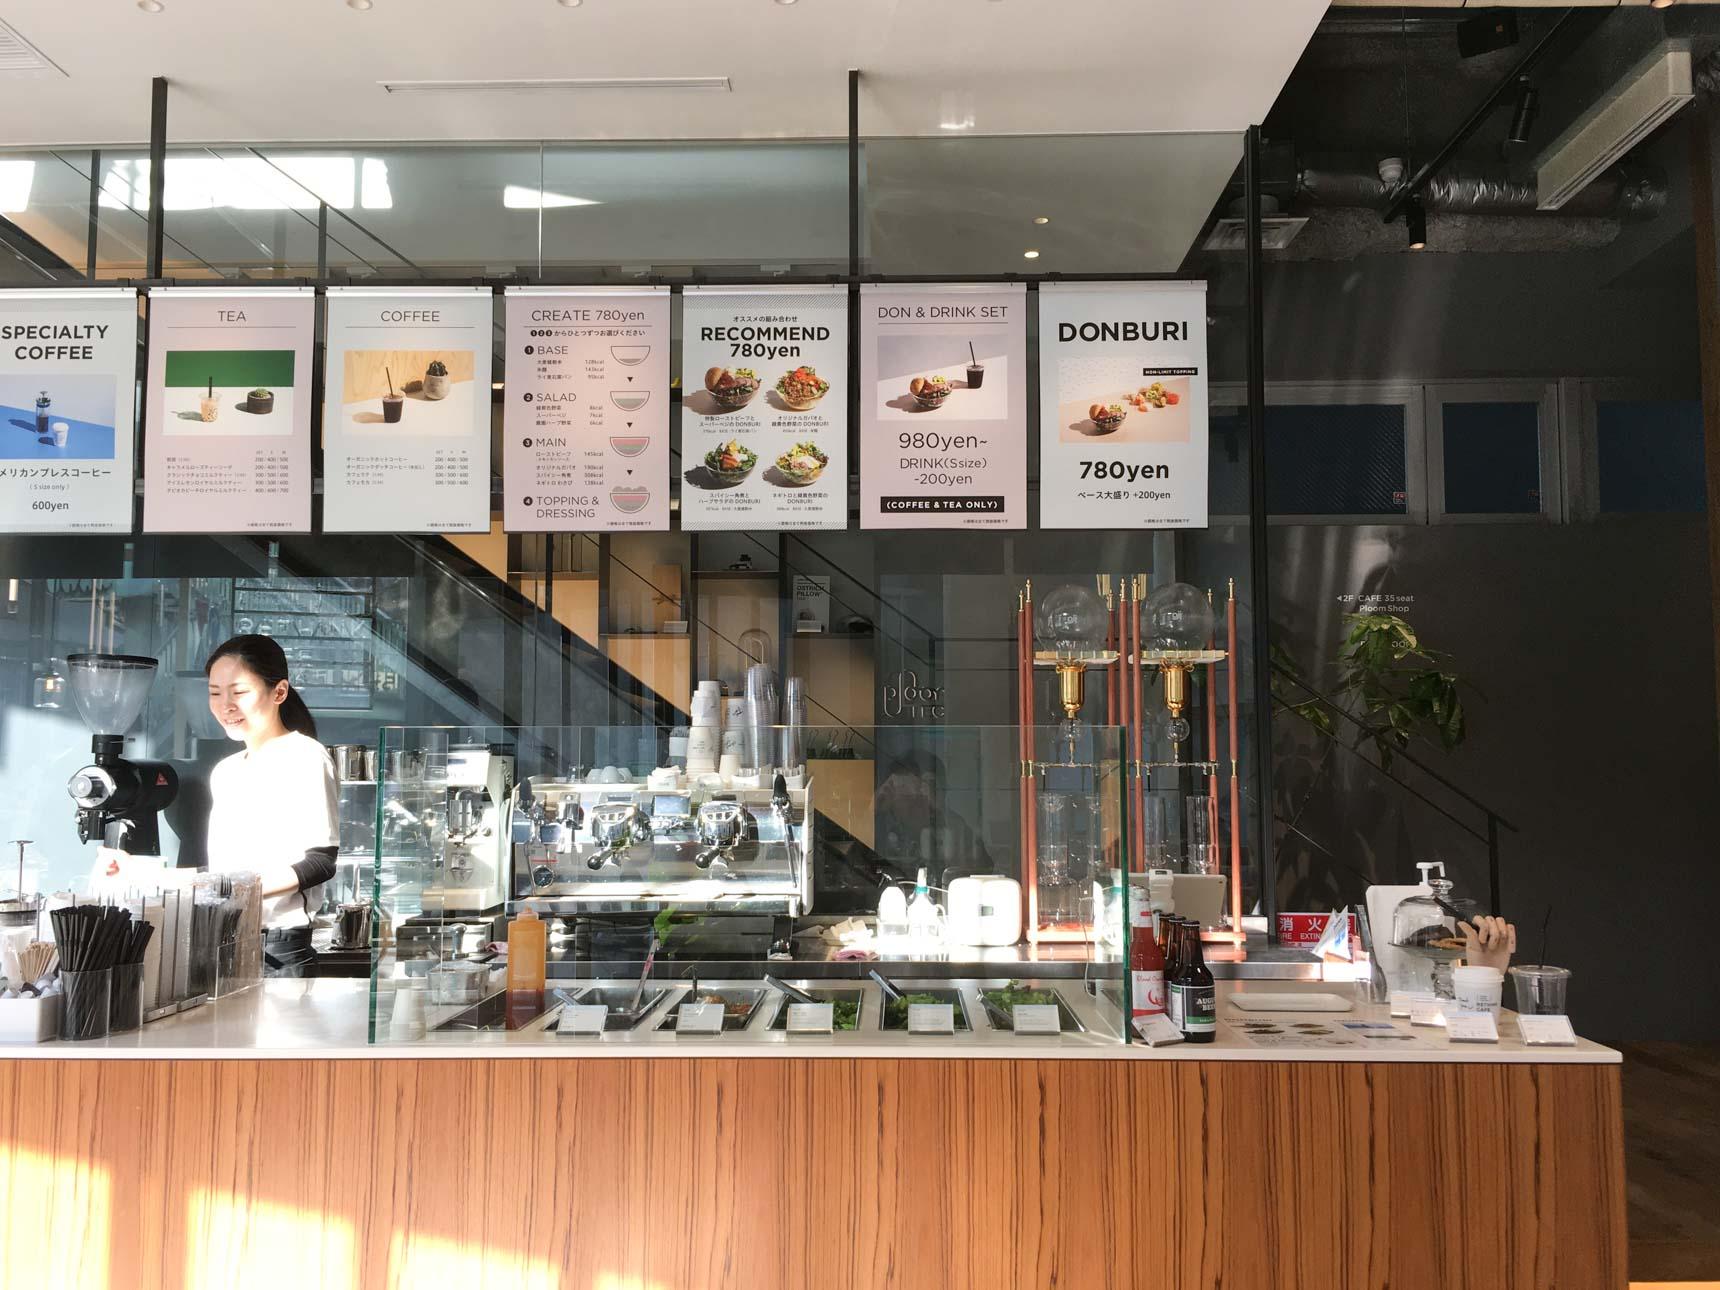 RETHINK CAFE SHIBUYA は、ノマドワーカーの理想郷?